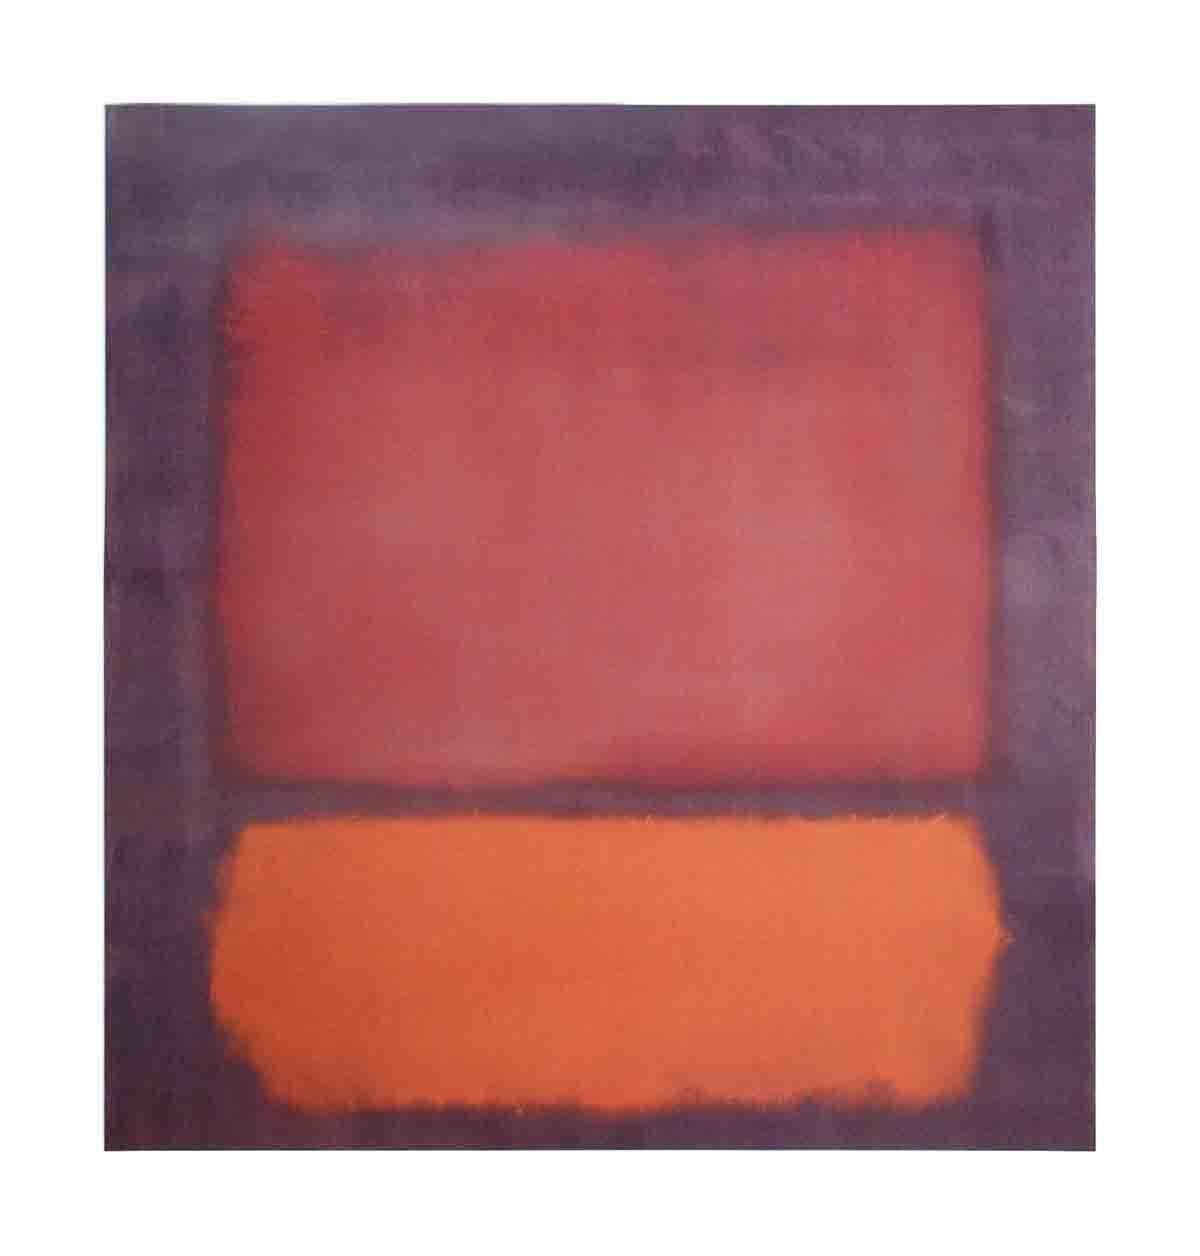 1998 Mark Rothko 'Untitled (1962)' Modernism Red,Orange,Purple Germany Offset